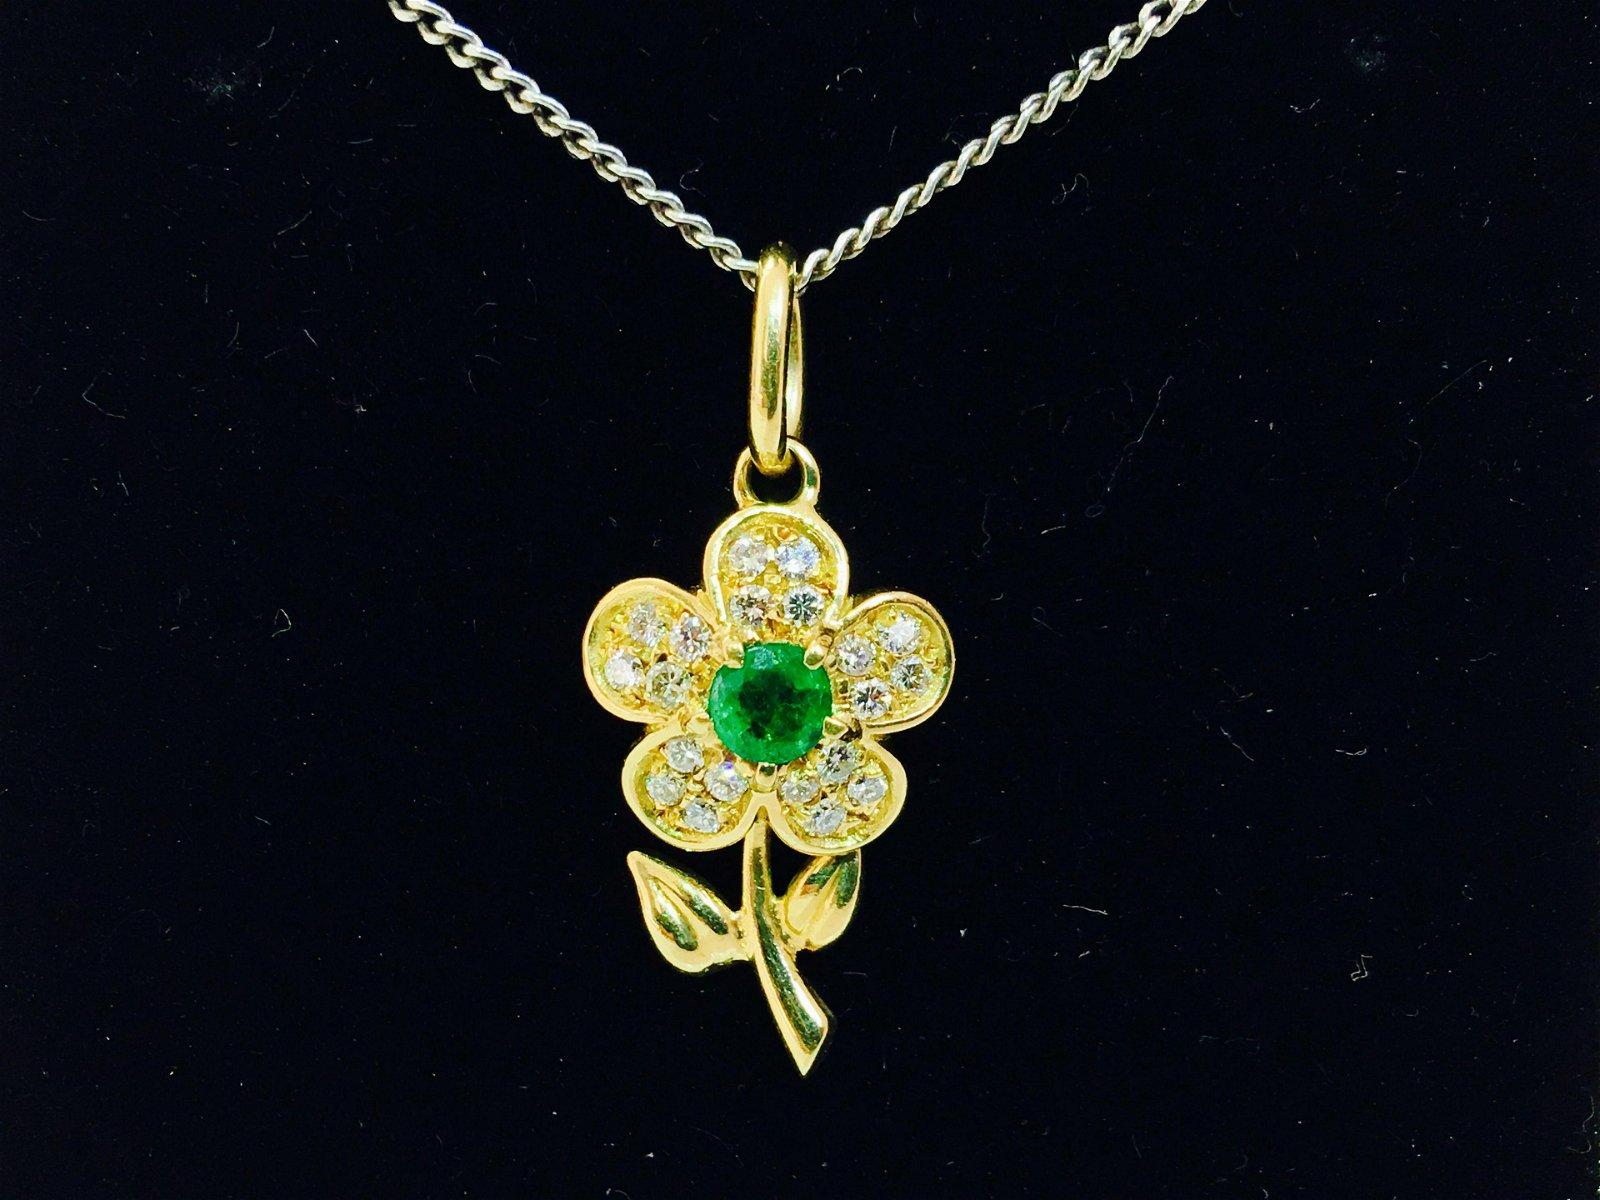 18K Gold. 0.75 Carat Emerald and Diamond Flower Pendant